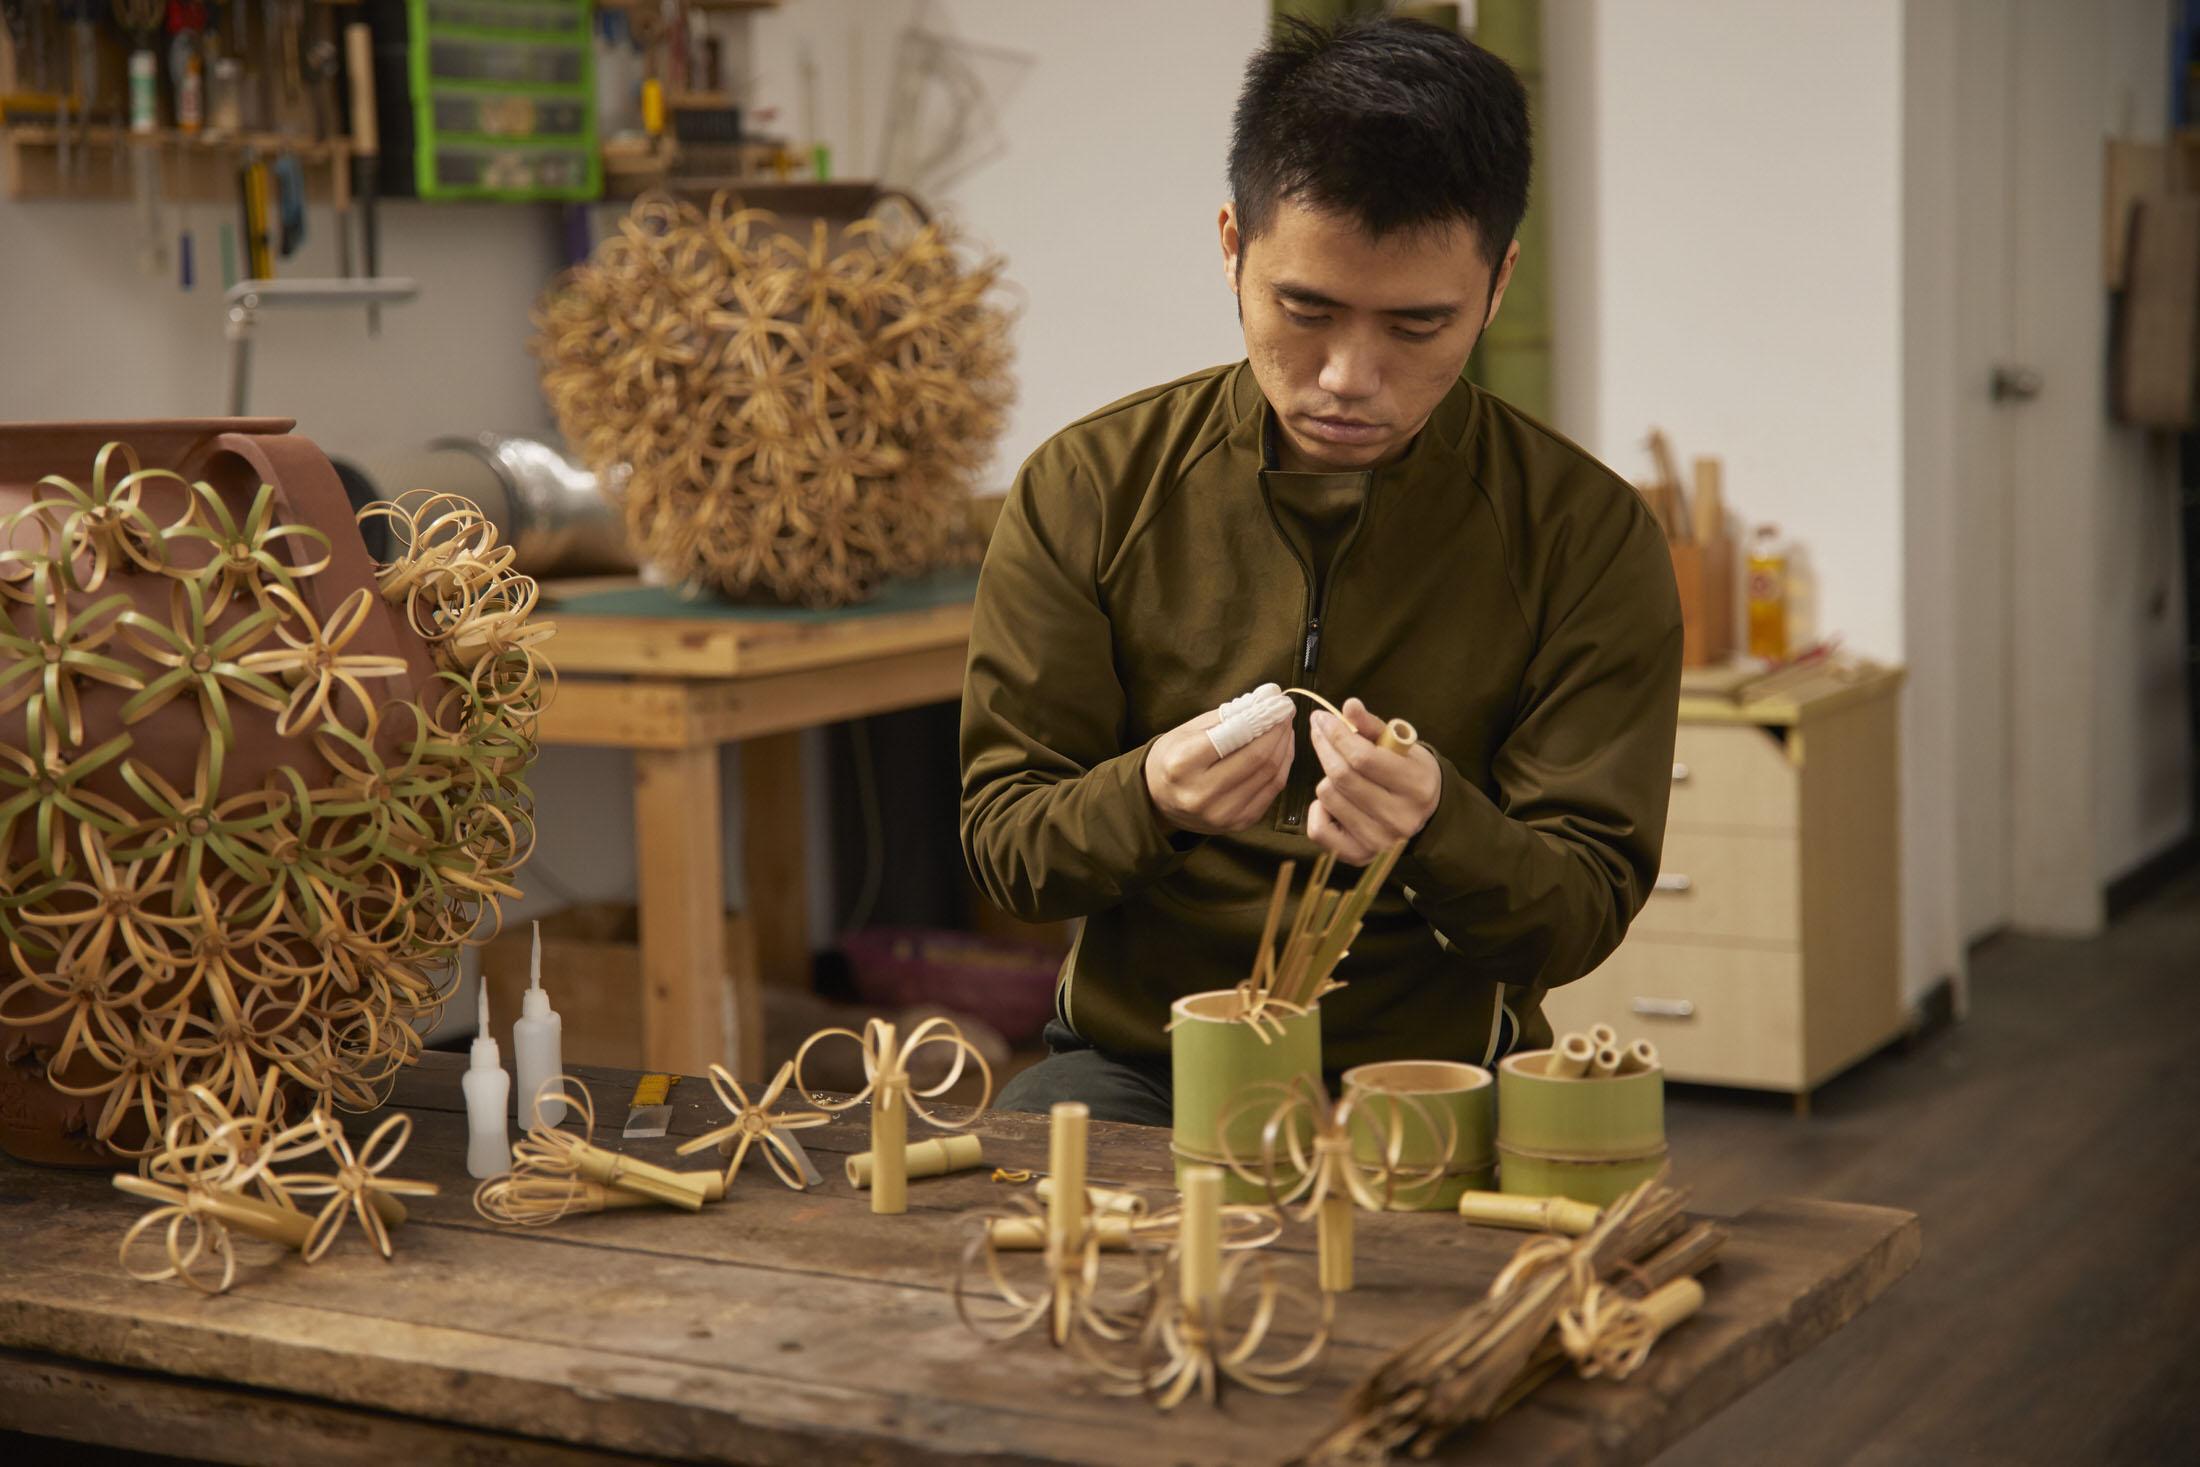 Loewe Waves Bamboo Artist Chen Min Yellowtrace 09